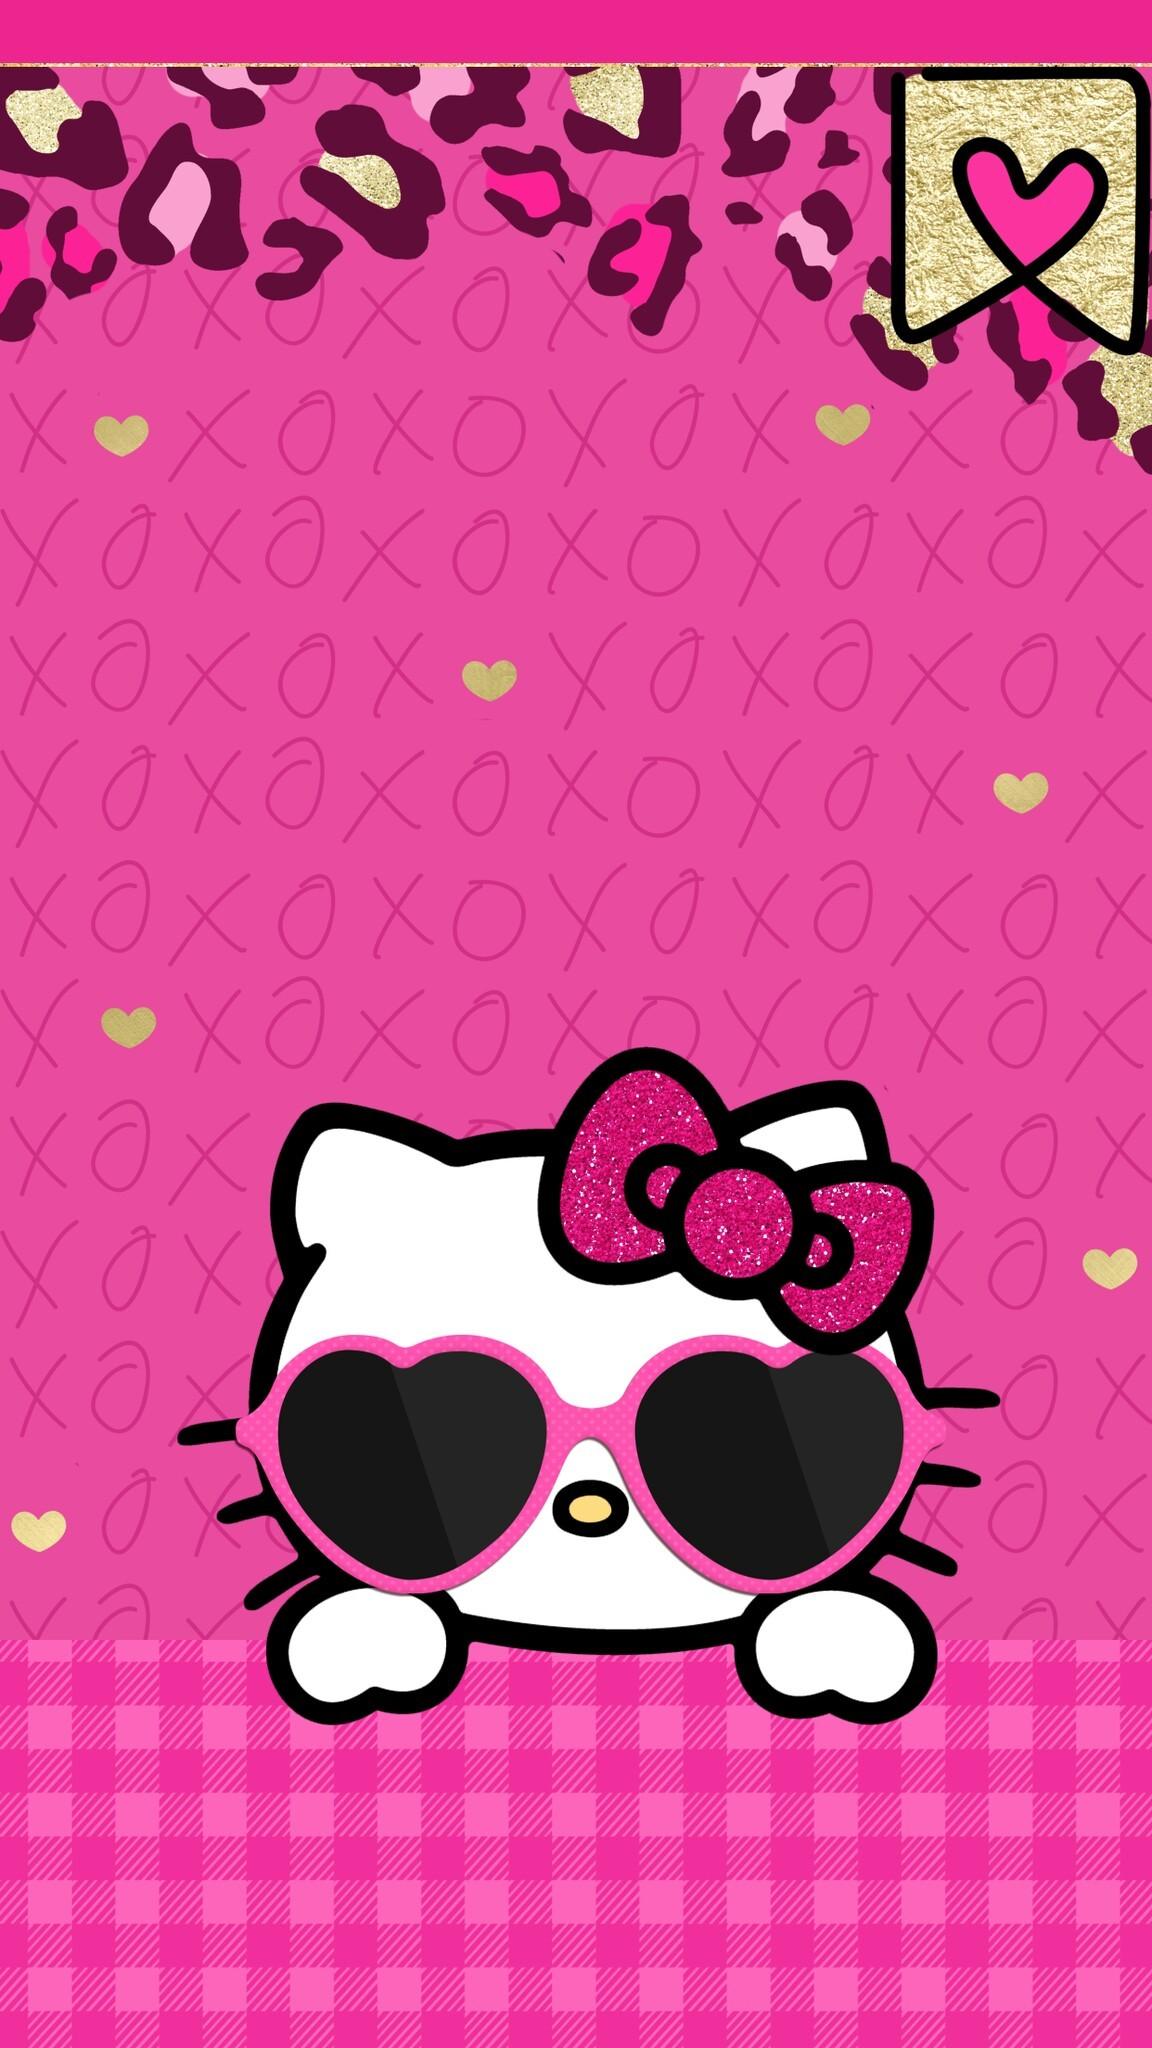 Most Inspiring Wallpaper Hello Kitty Ipod Touch - 95180  Photograph_854158.jpg